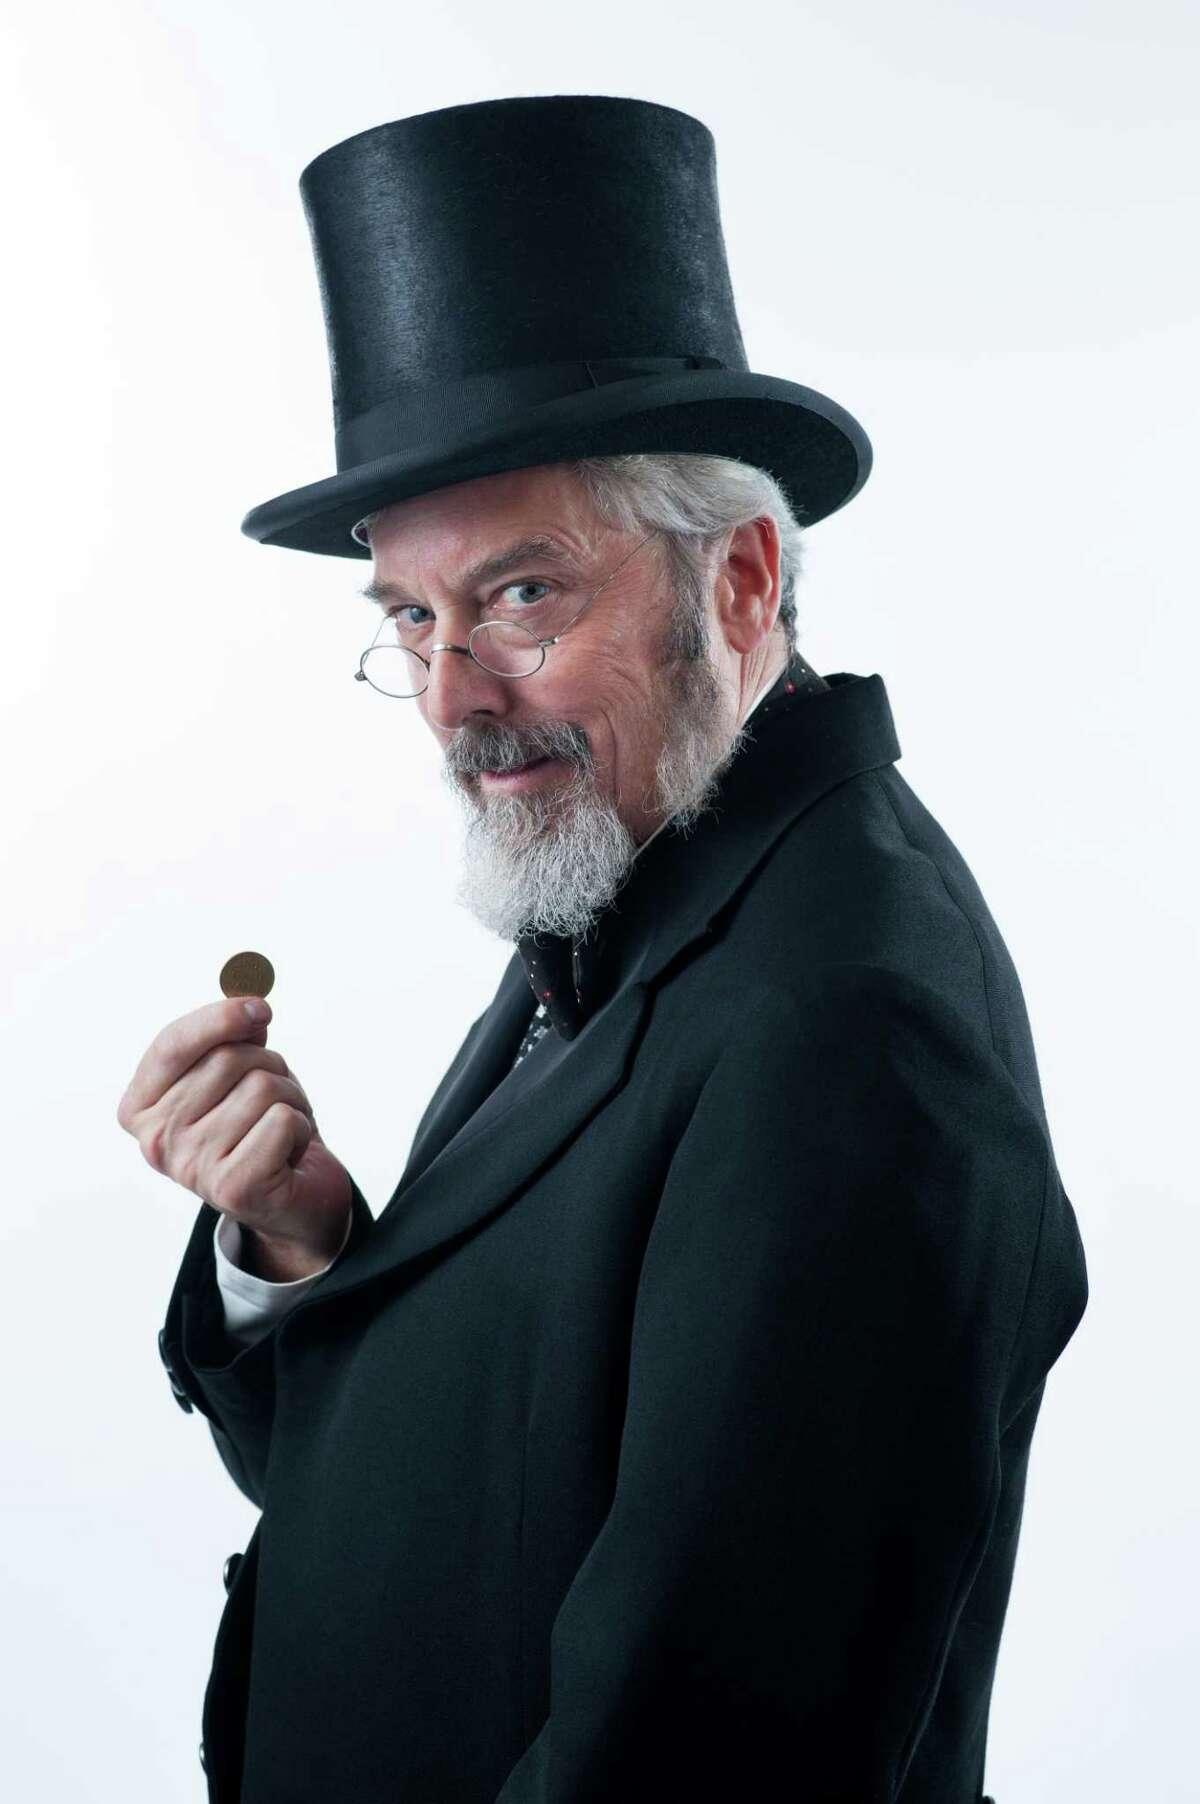 Michael Preston stars as Ebenezer Scrooge in